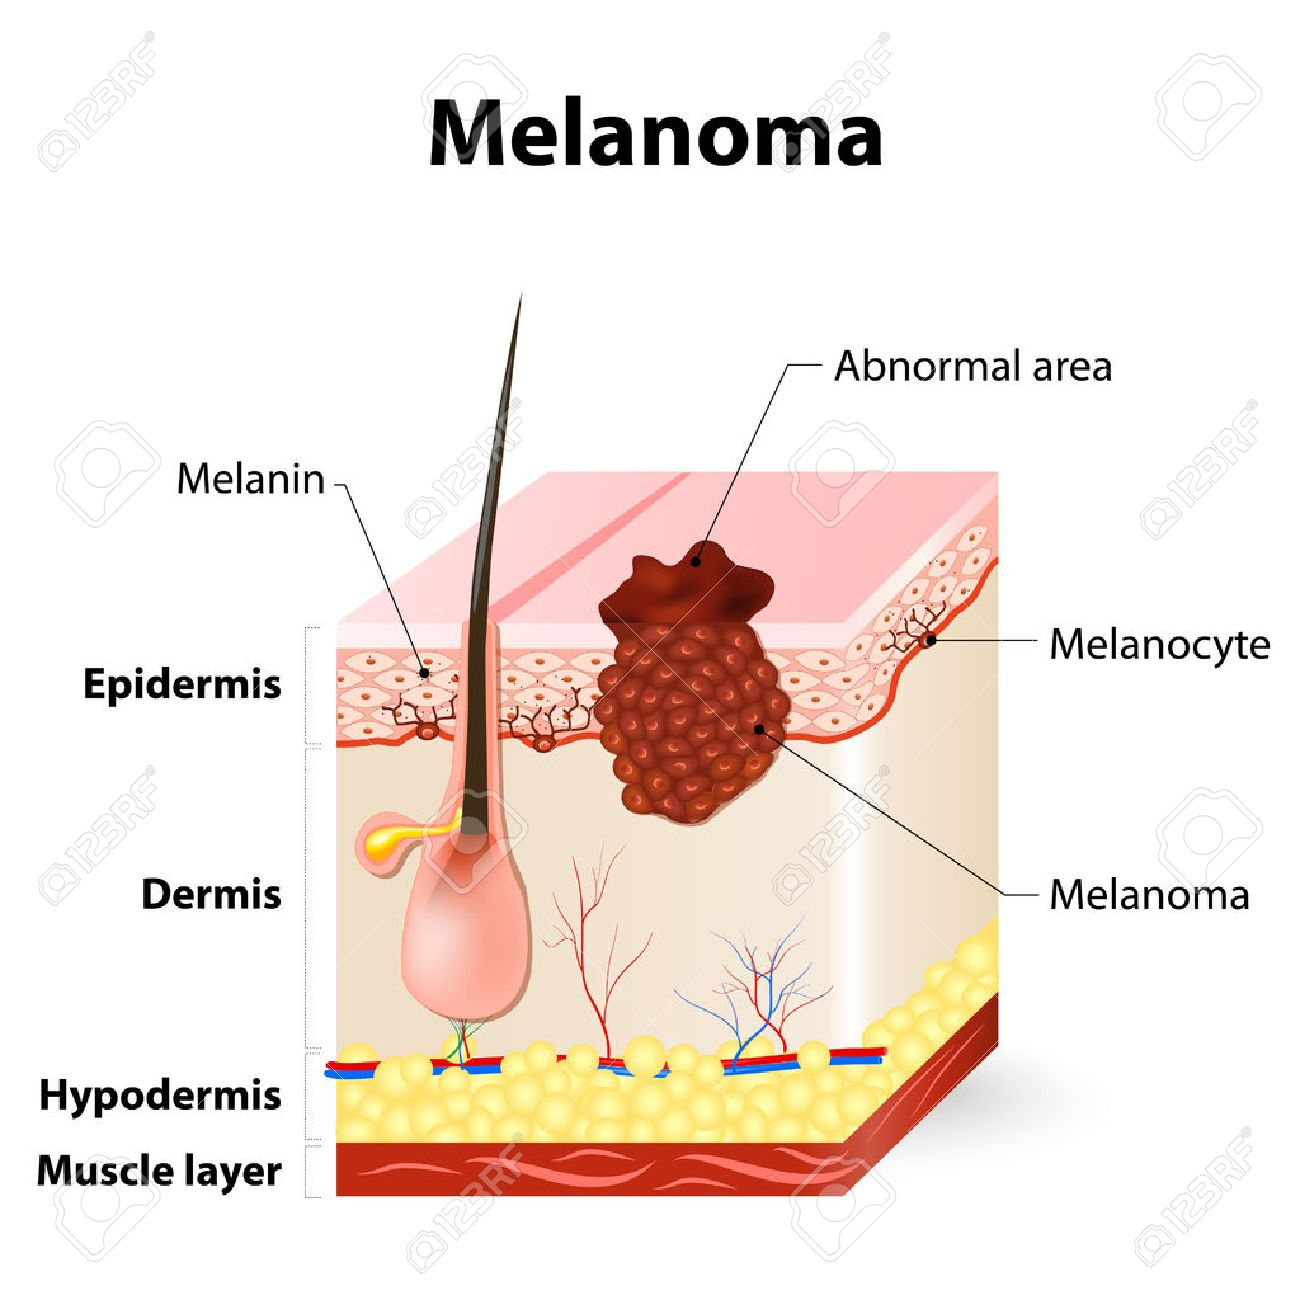 Diagram of melanoma auto electrical wiring diagram melanoma or skin cancer this rare type of skin cancer originates rh 123rf com basal cell ccuart Gallery